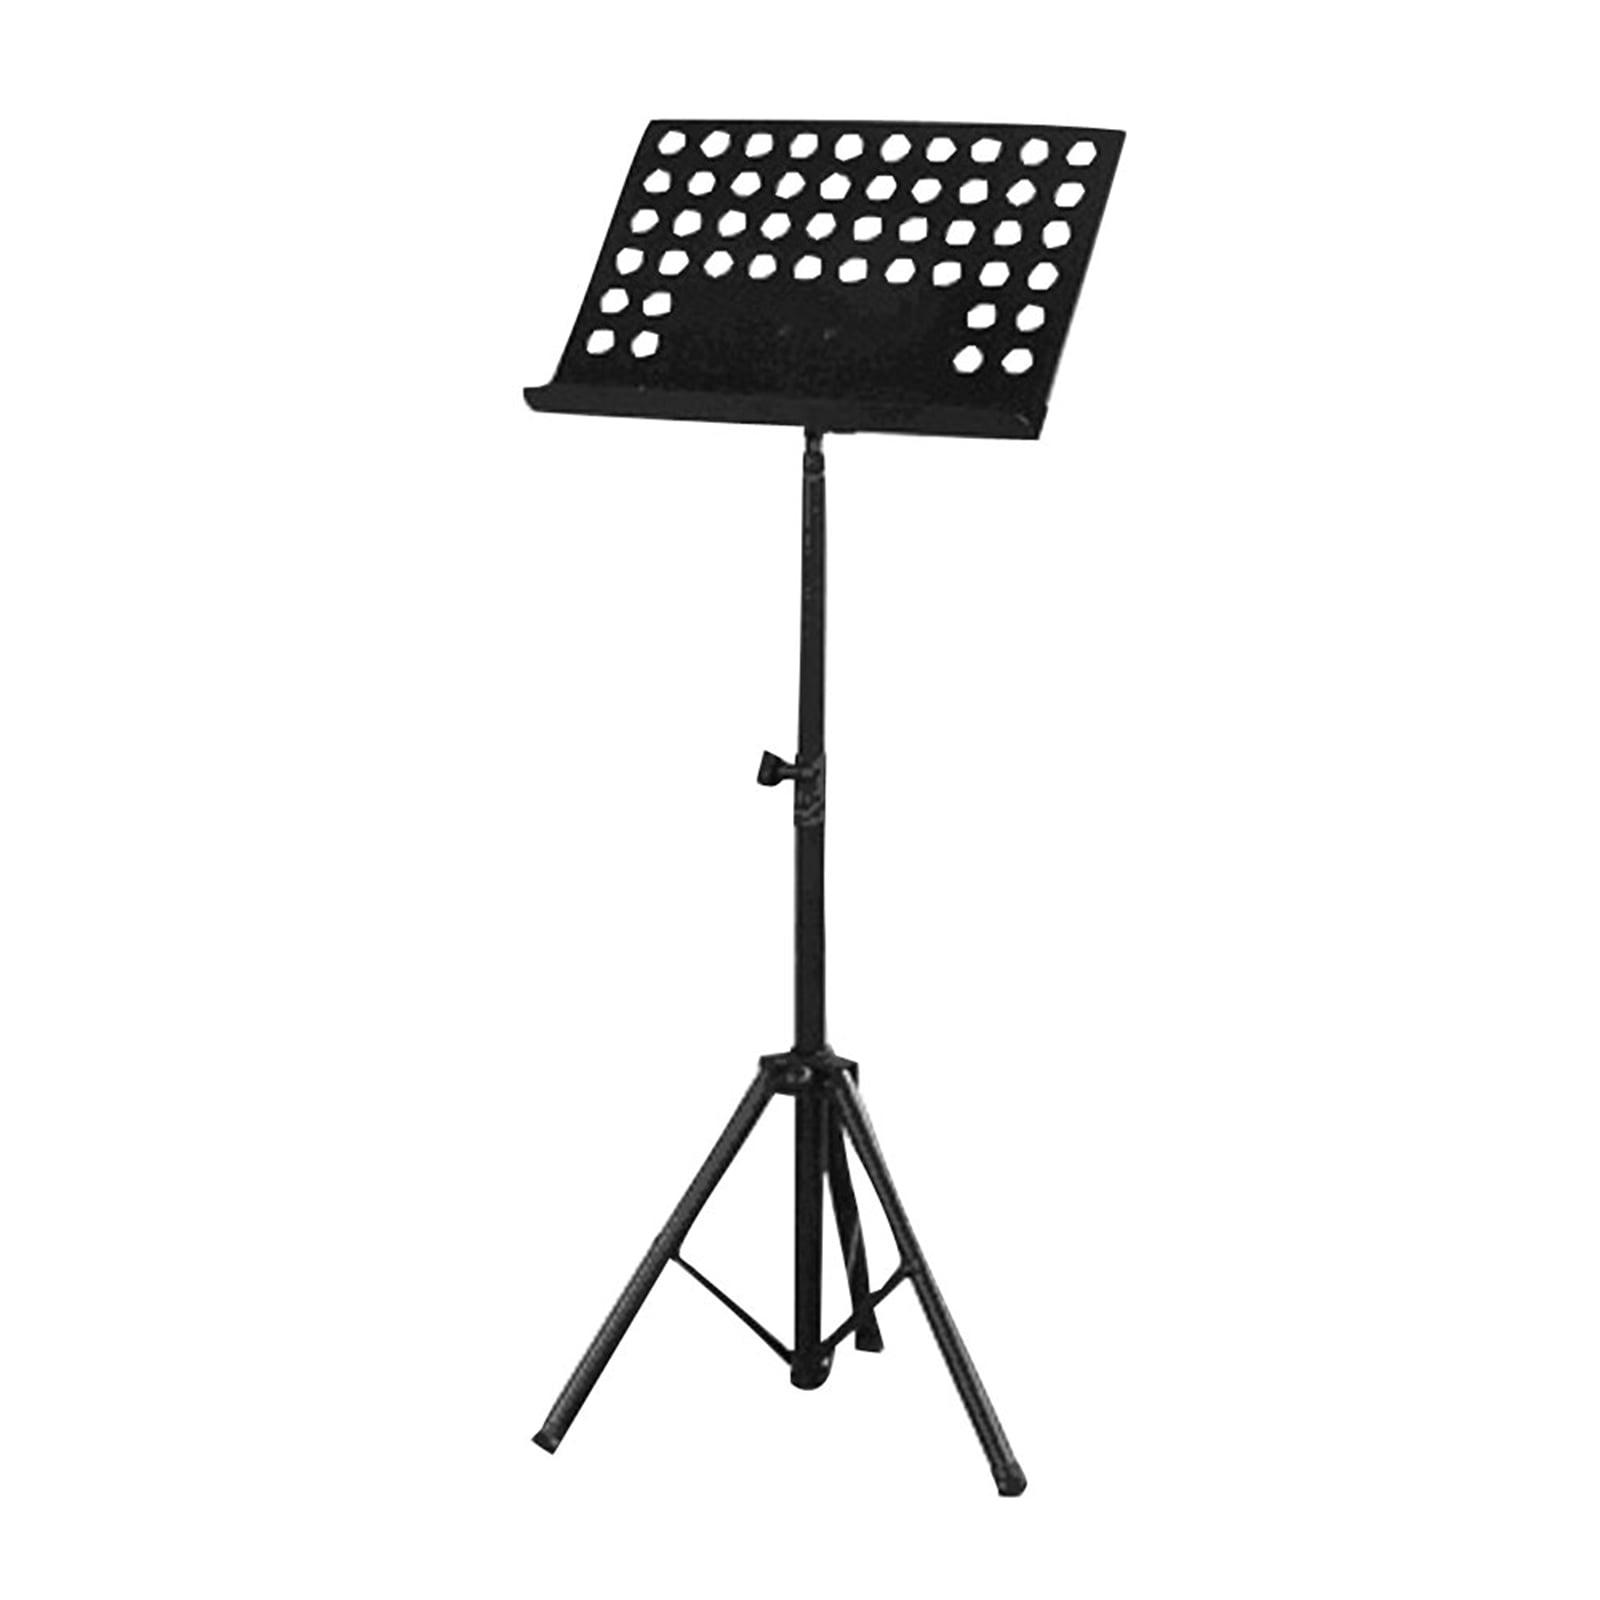 PylePro - PMS1 - Heavy Duty Tripod Music Note Stand